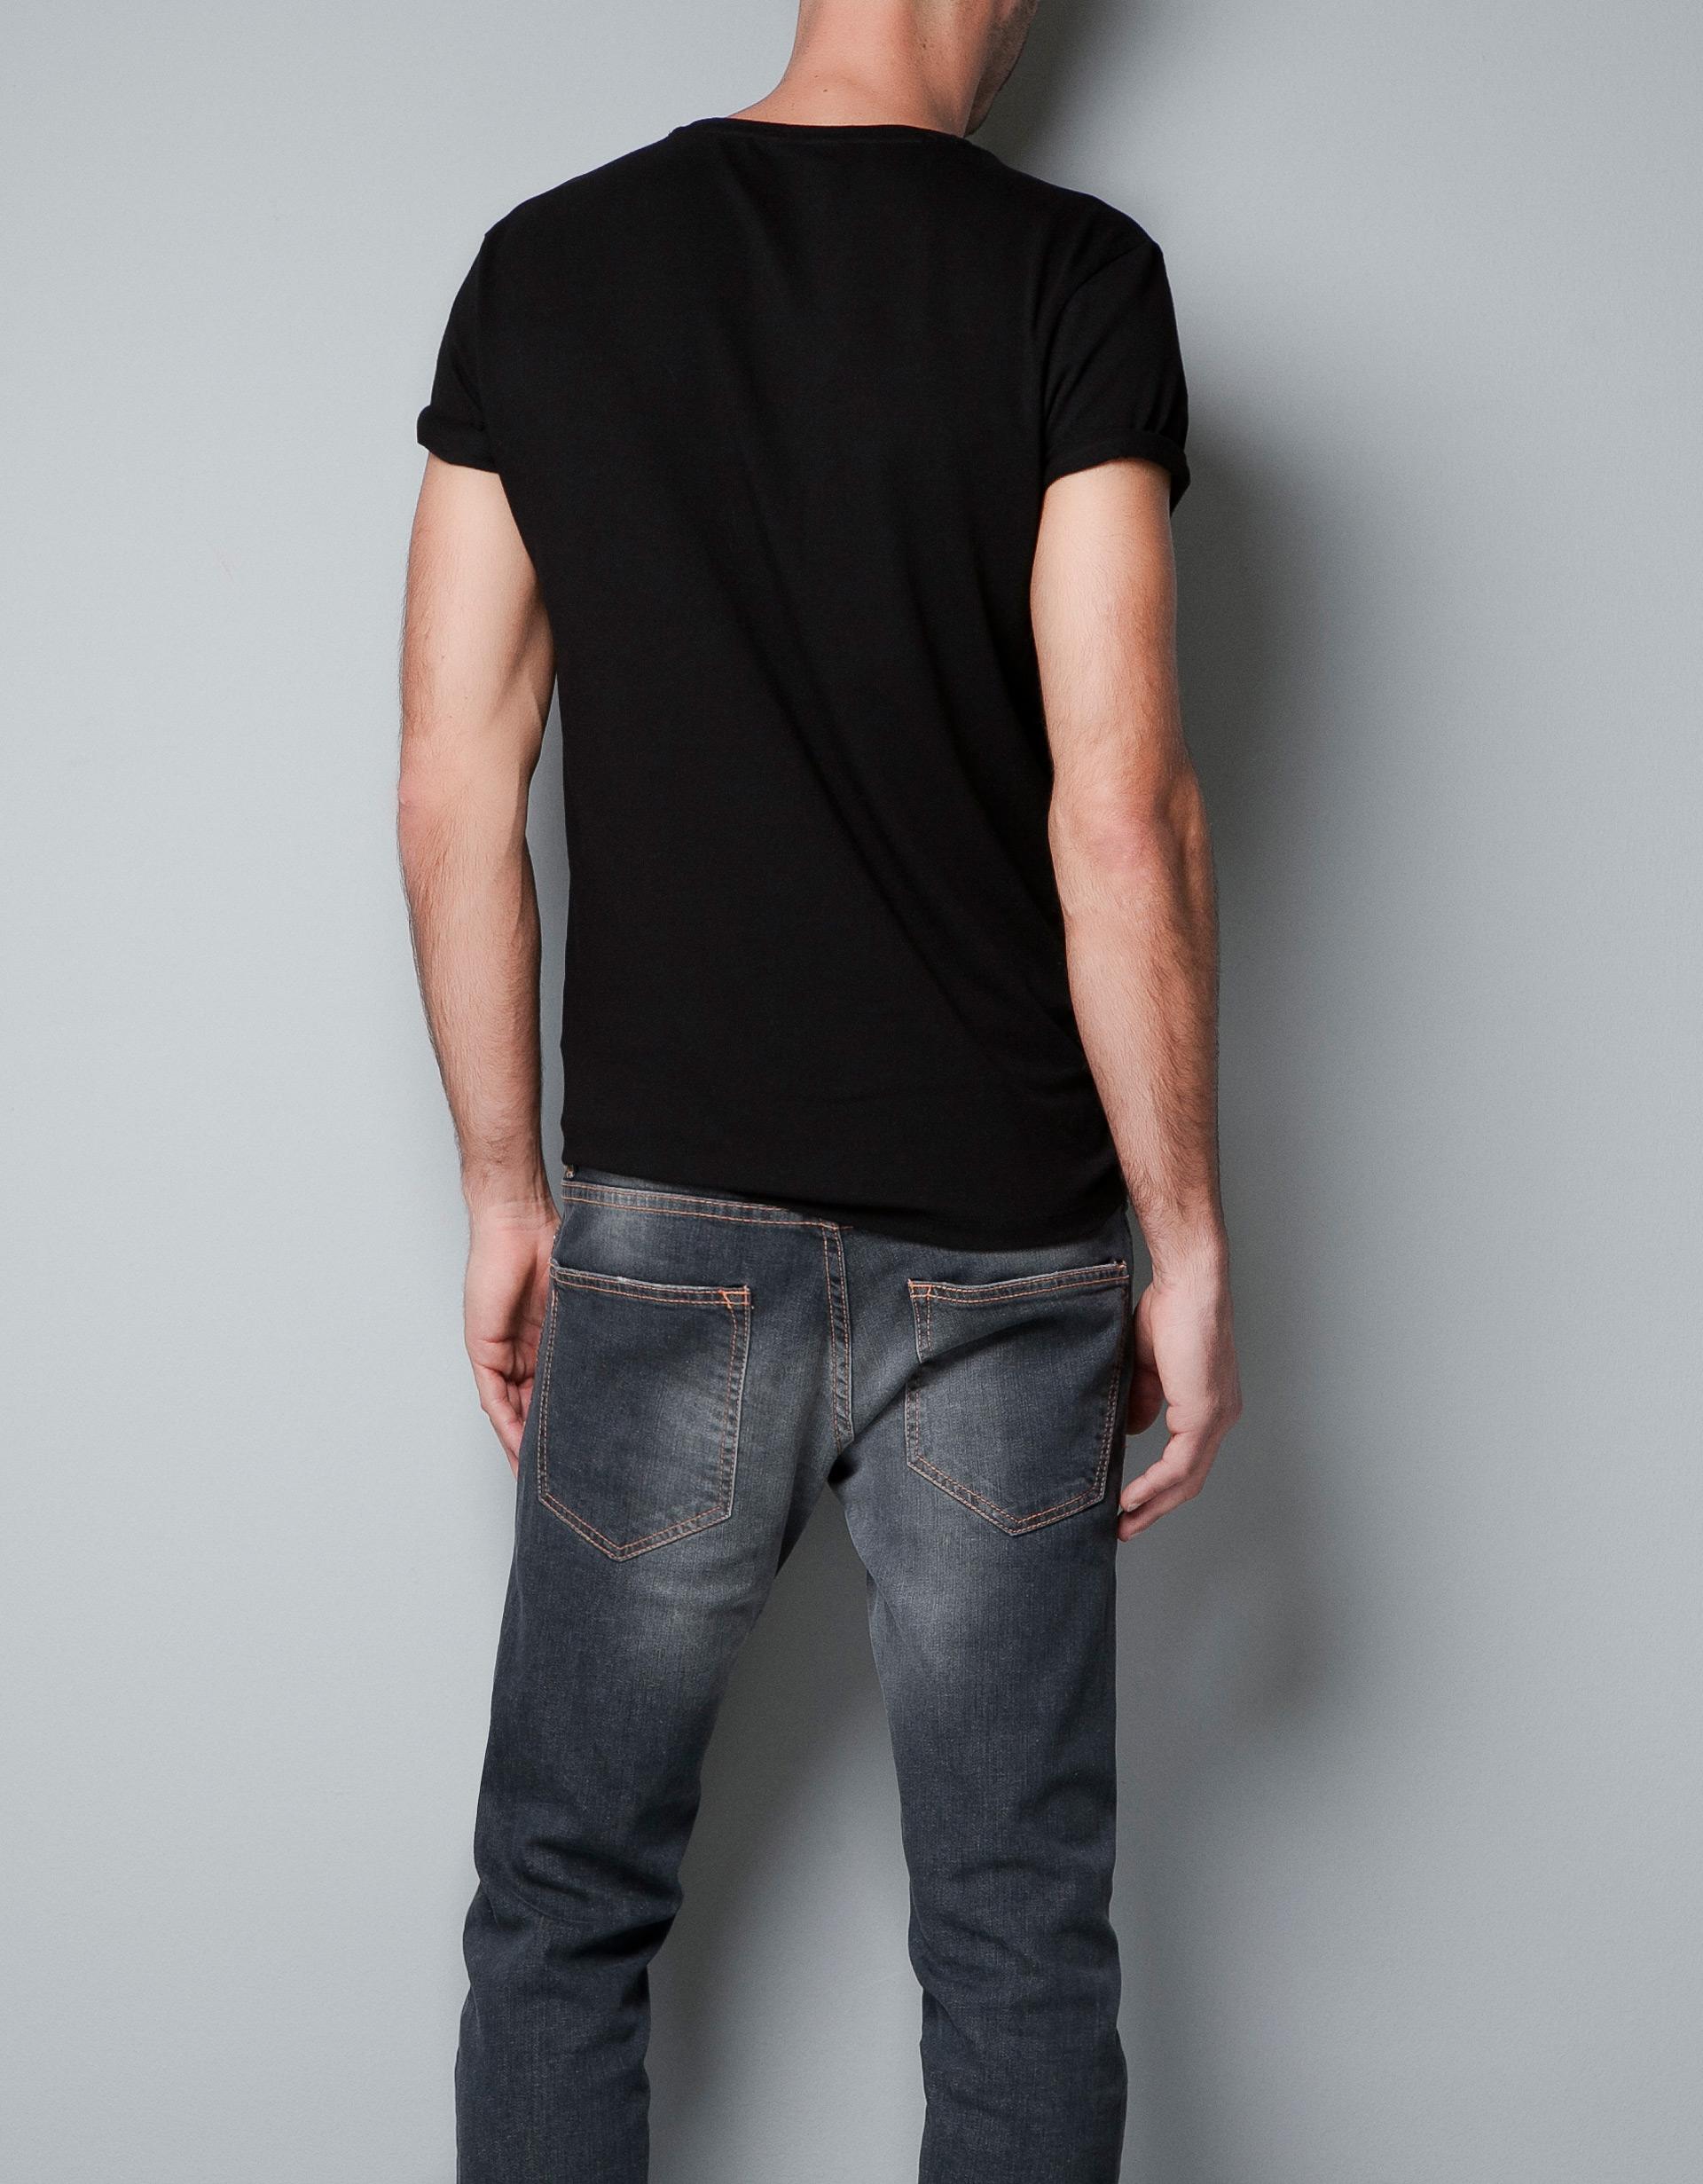 Zara Super Slim Fit T Shirt In Black For Men Lyst